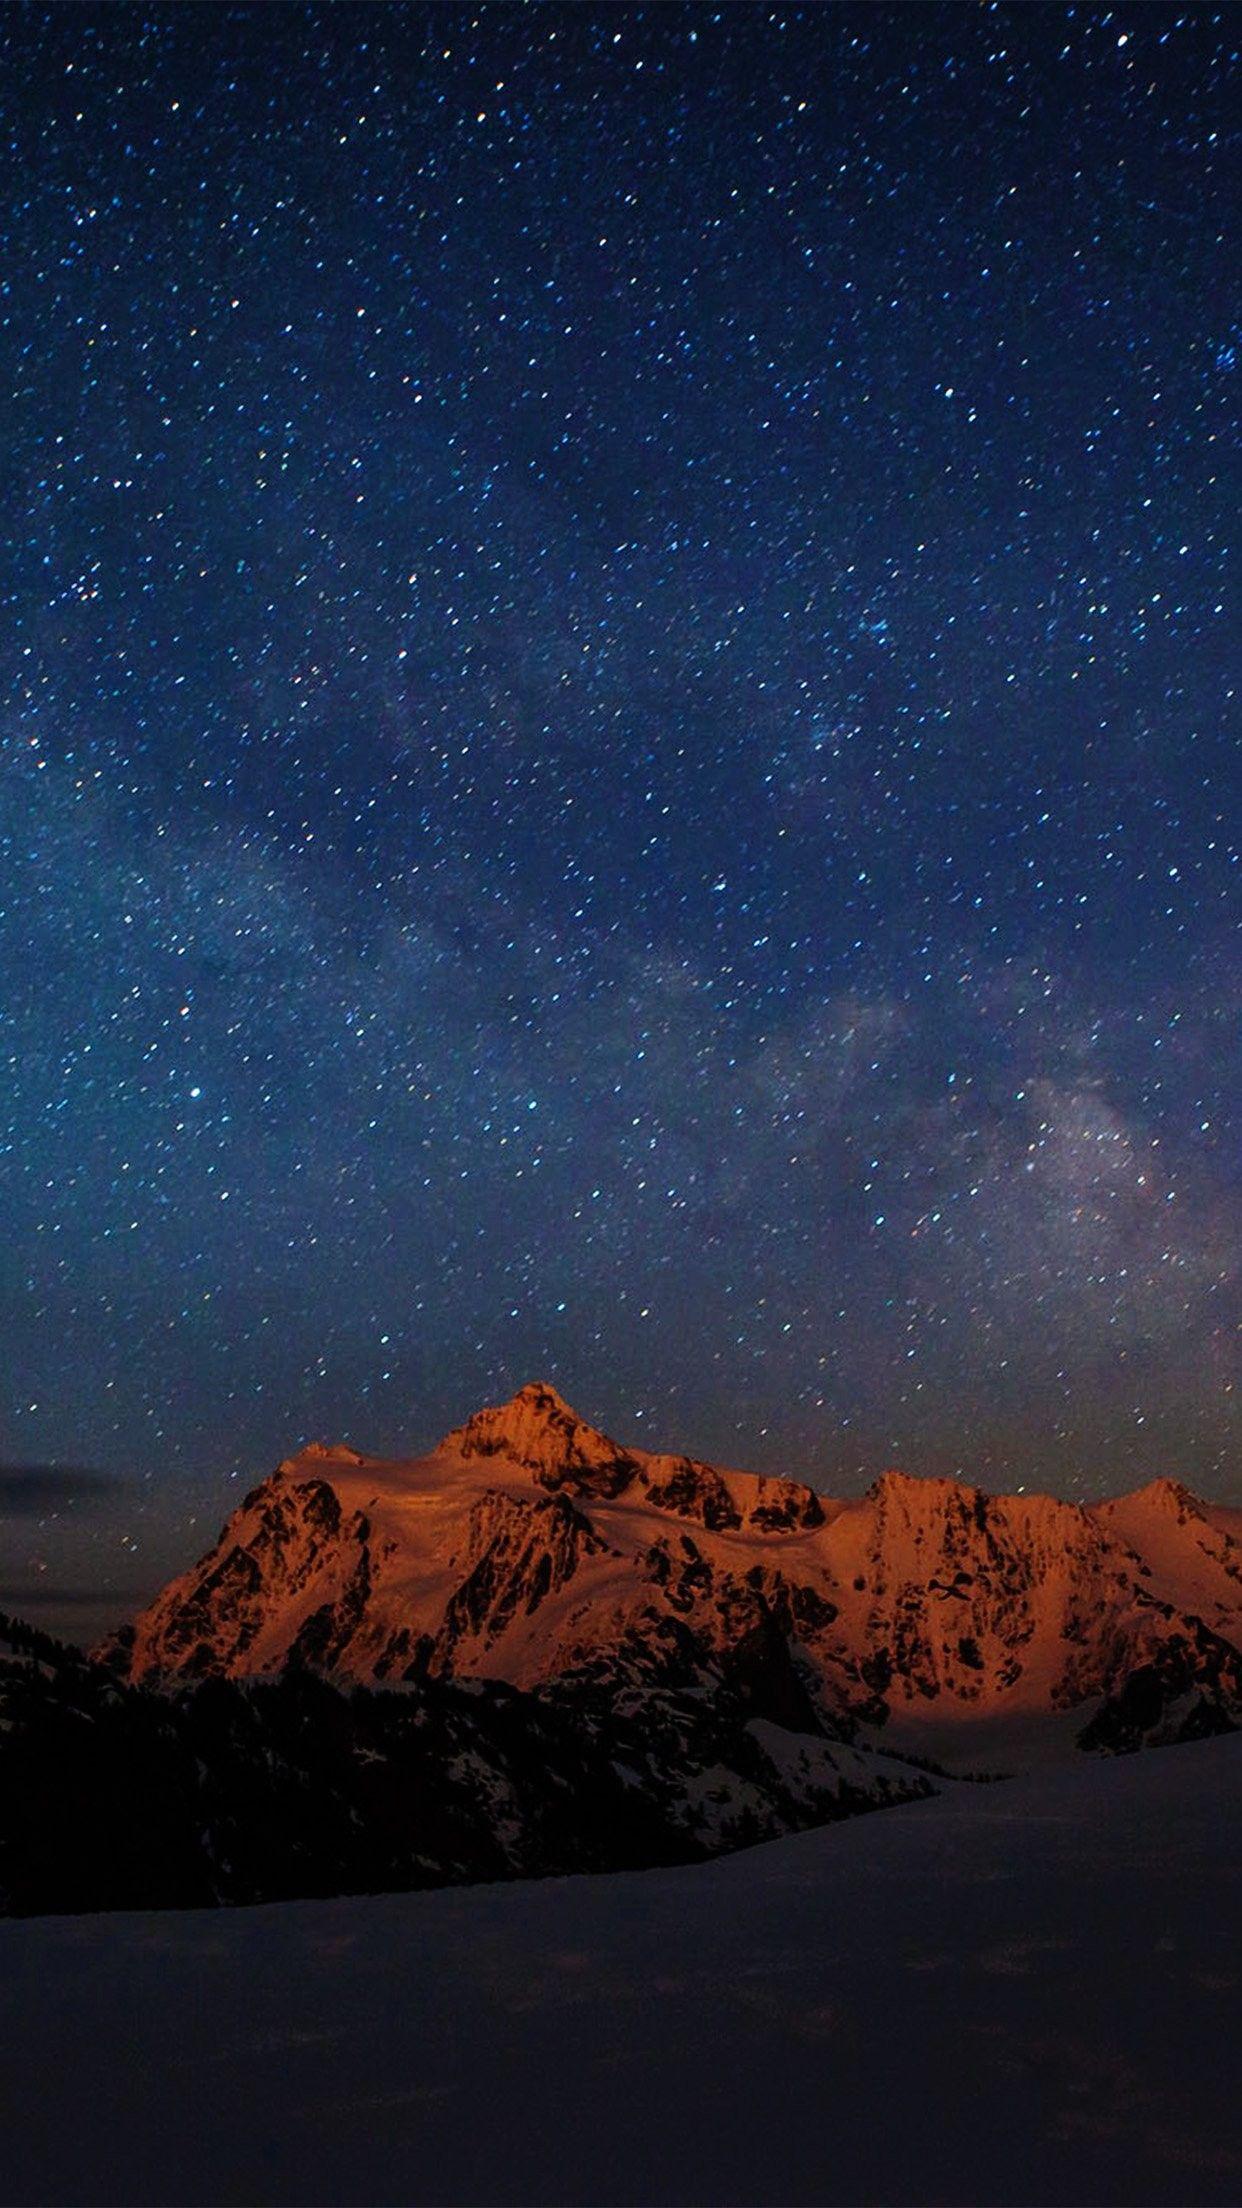 Starry Night Fondos de pantalla